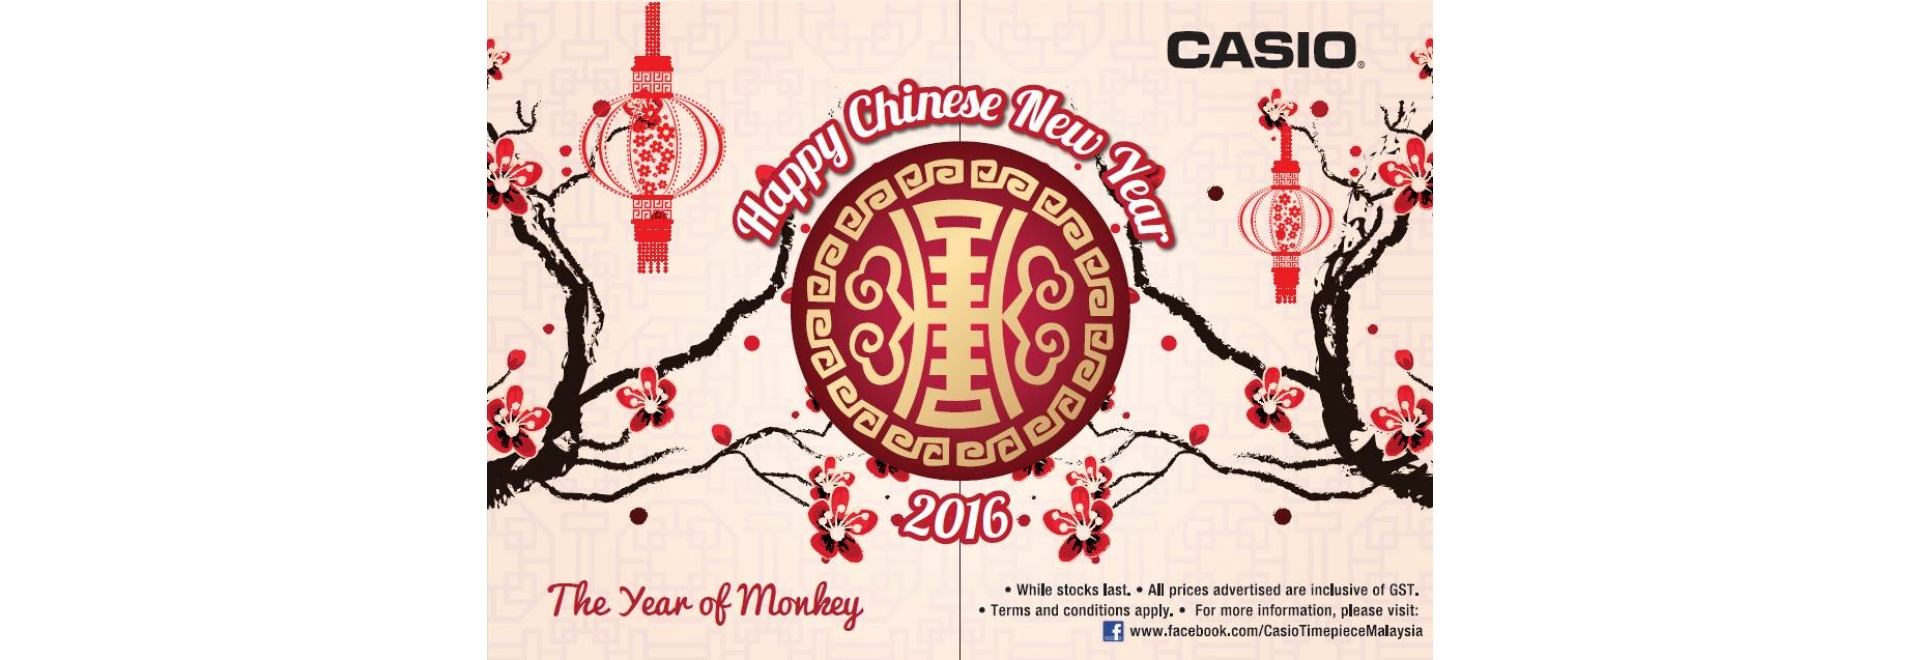 Casio CNY Lunar Promotion